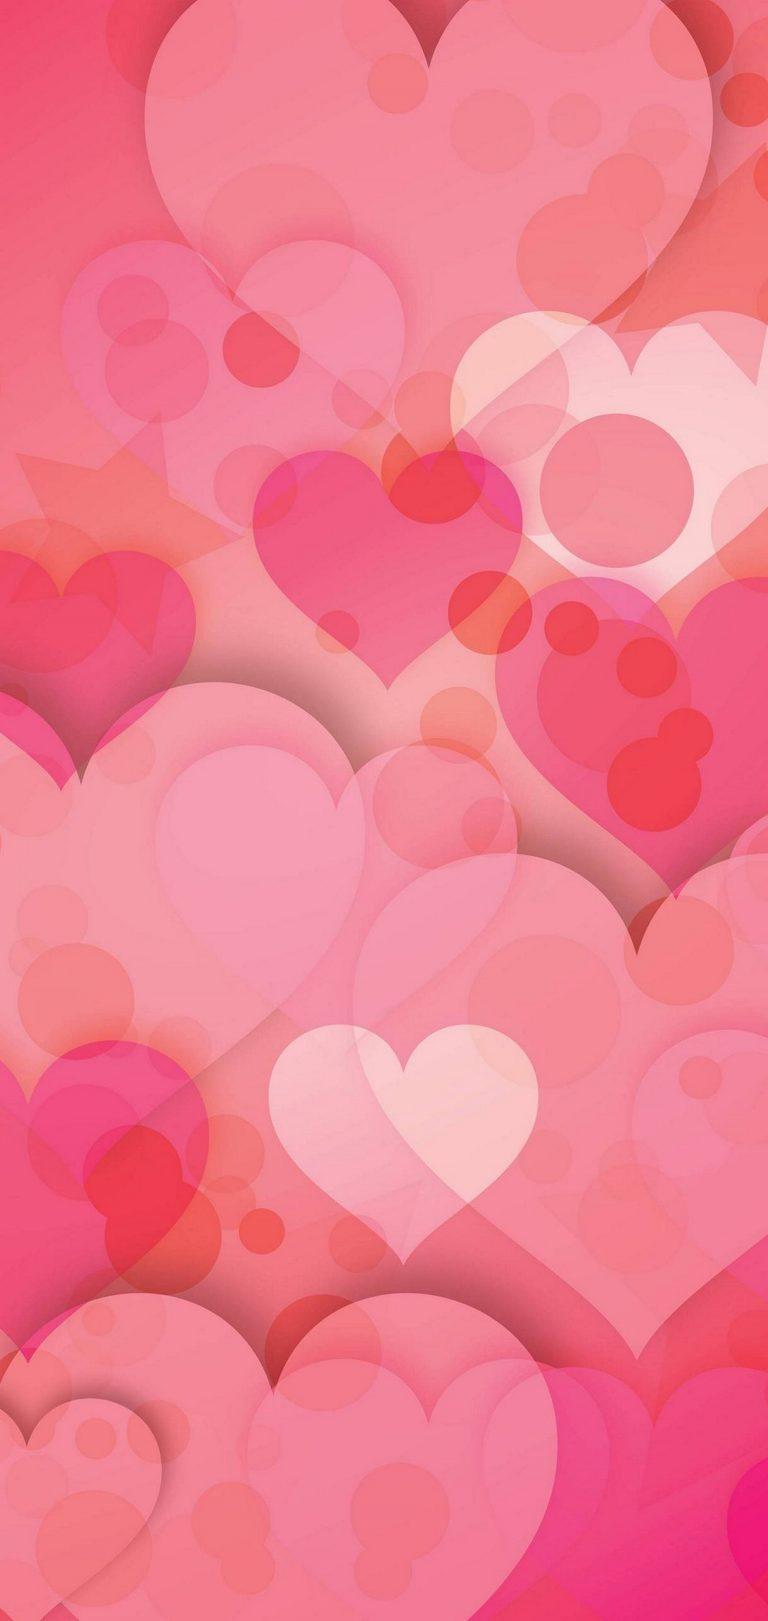 Hearts Love Pinky Wallpaper 1440x3040 768x1621